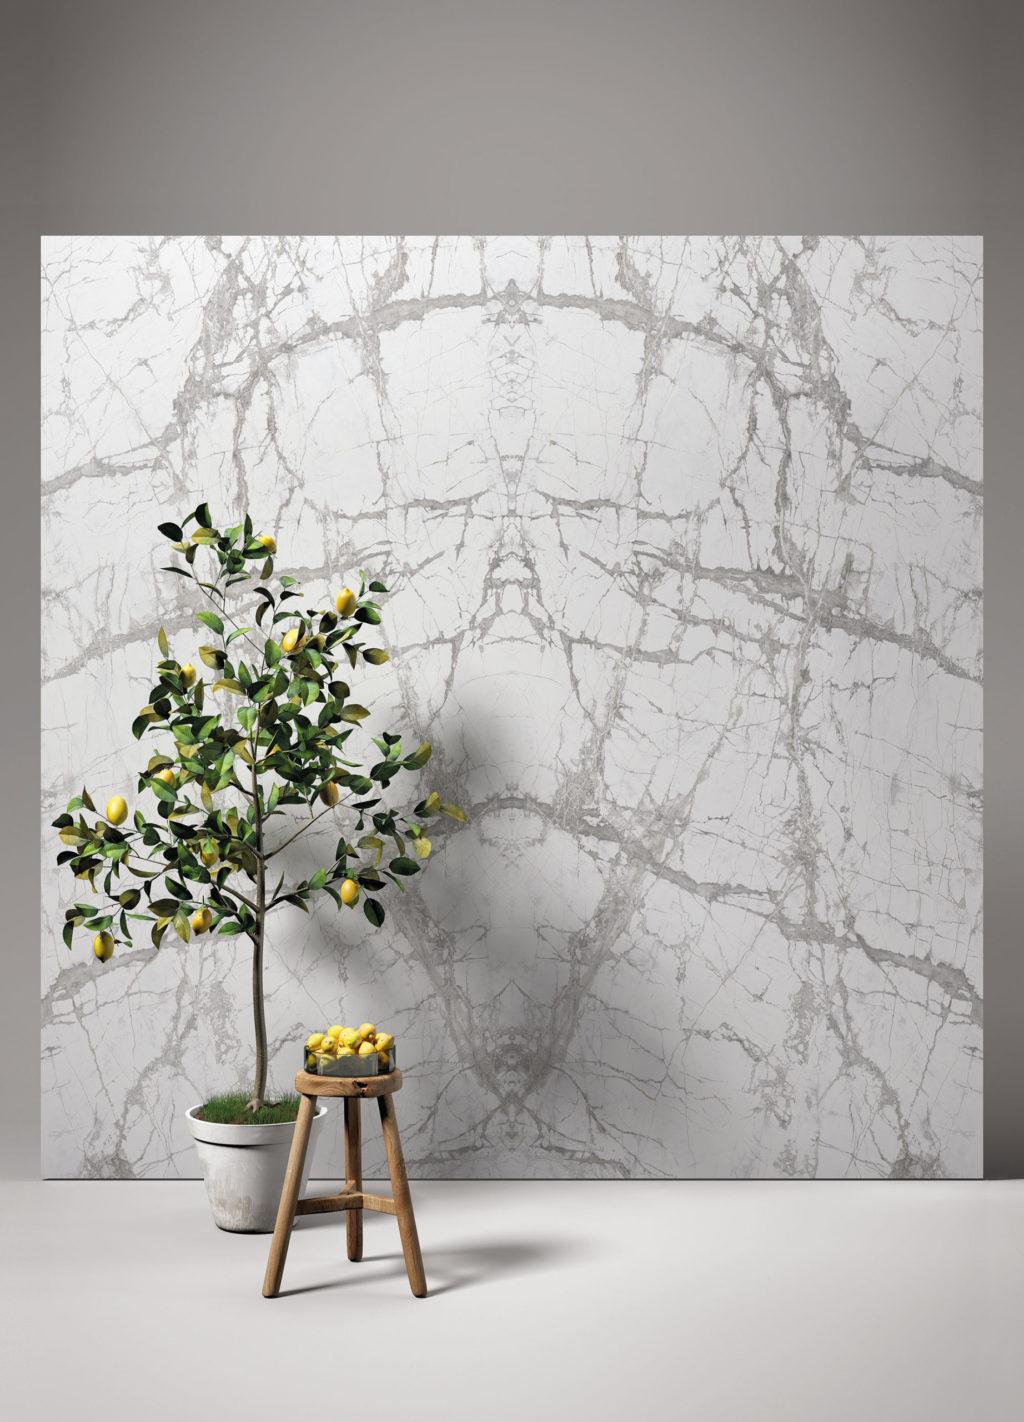 https://desidea.hu/wp-content/uploads/fly-images/162547/level-marmi-marvany-koporcelan-emil-ceramica-invisible1-scaled-1024x0.jpg